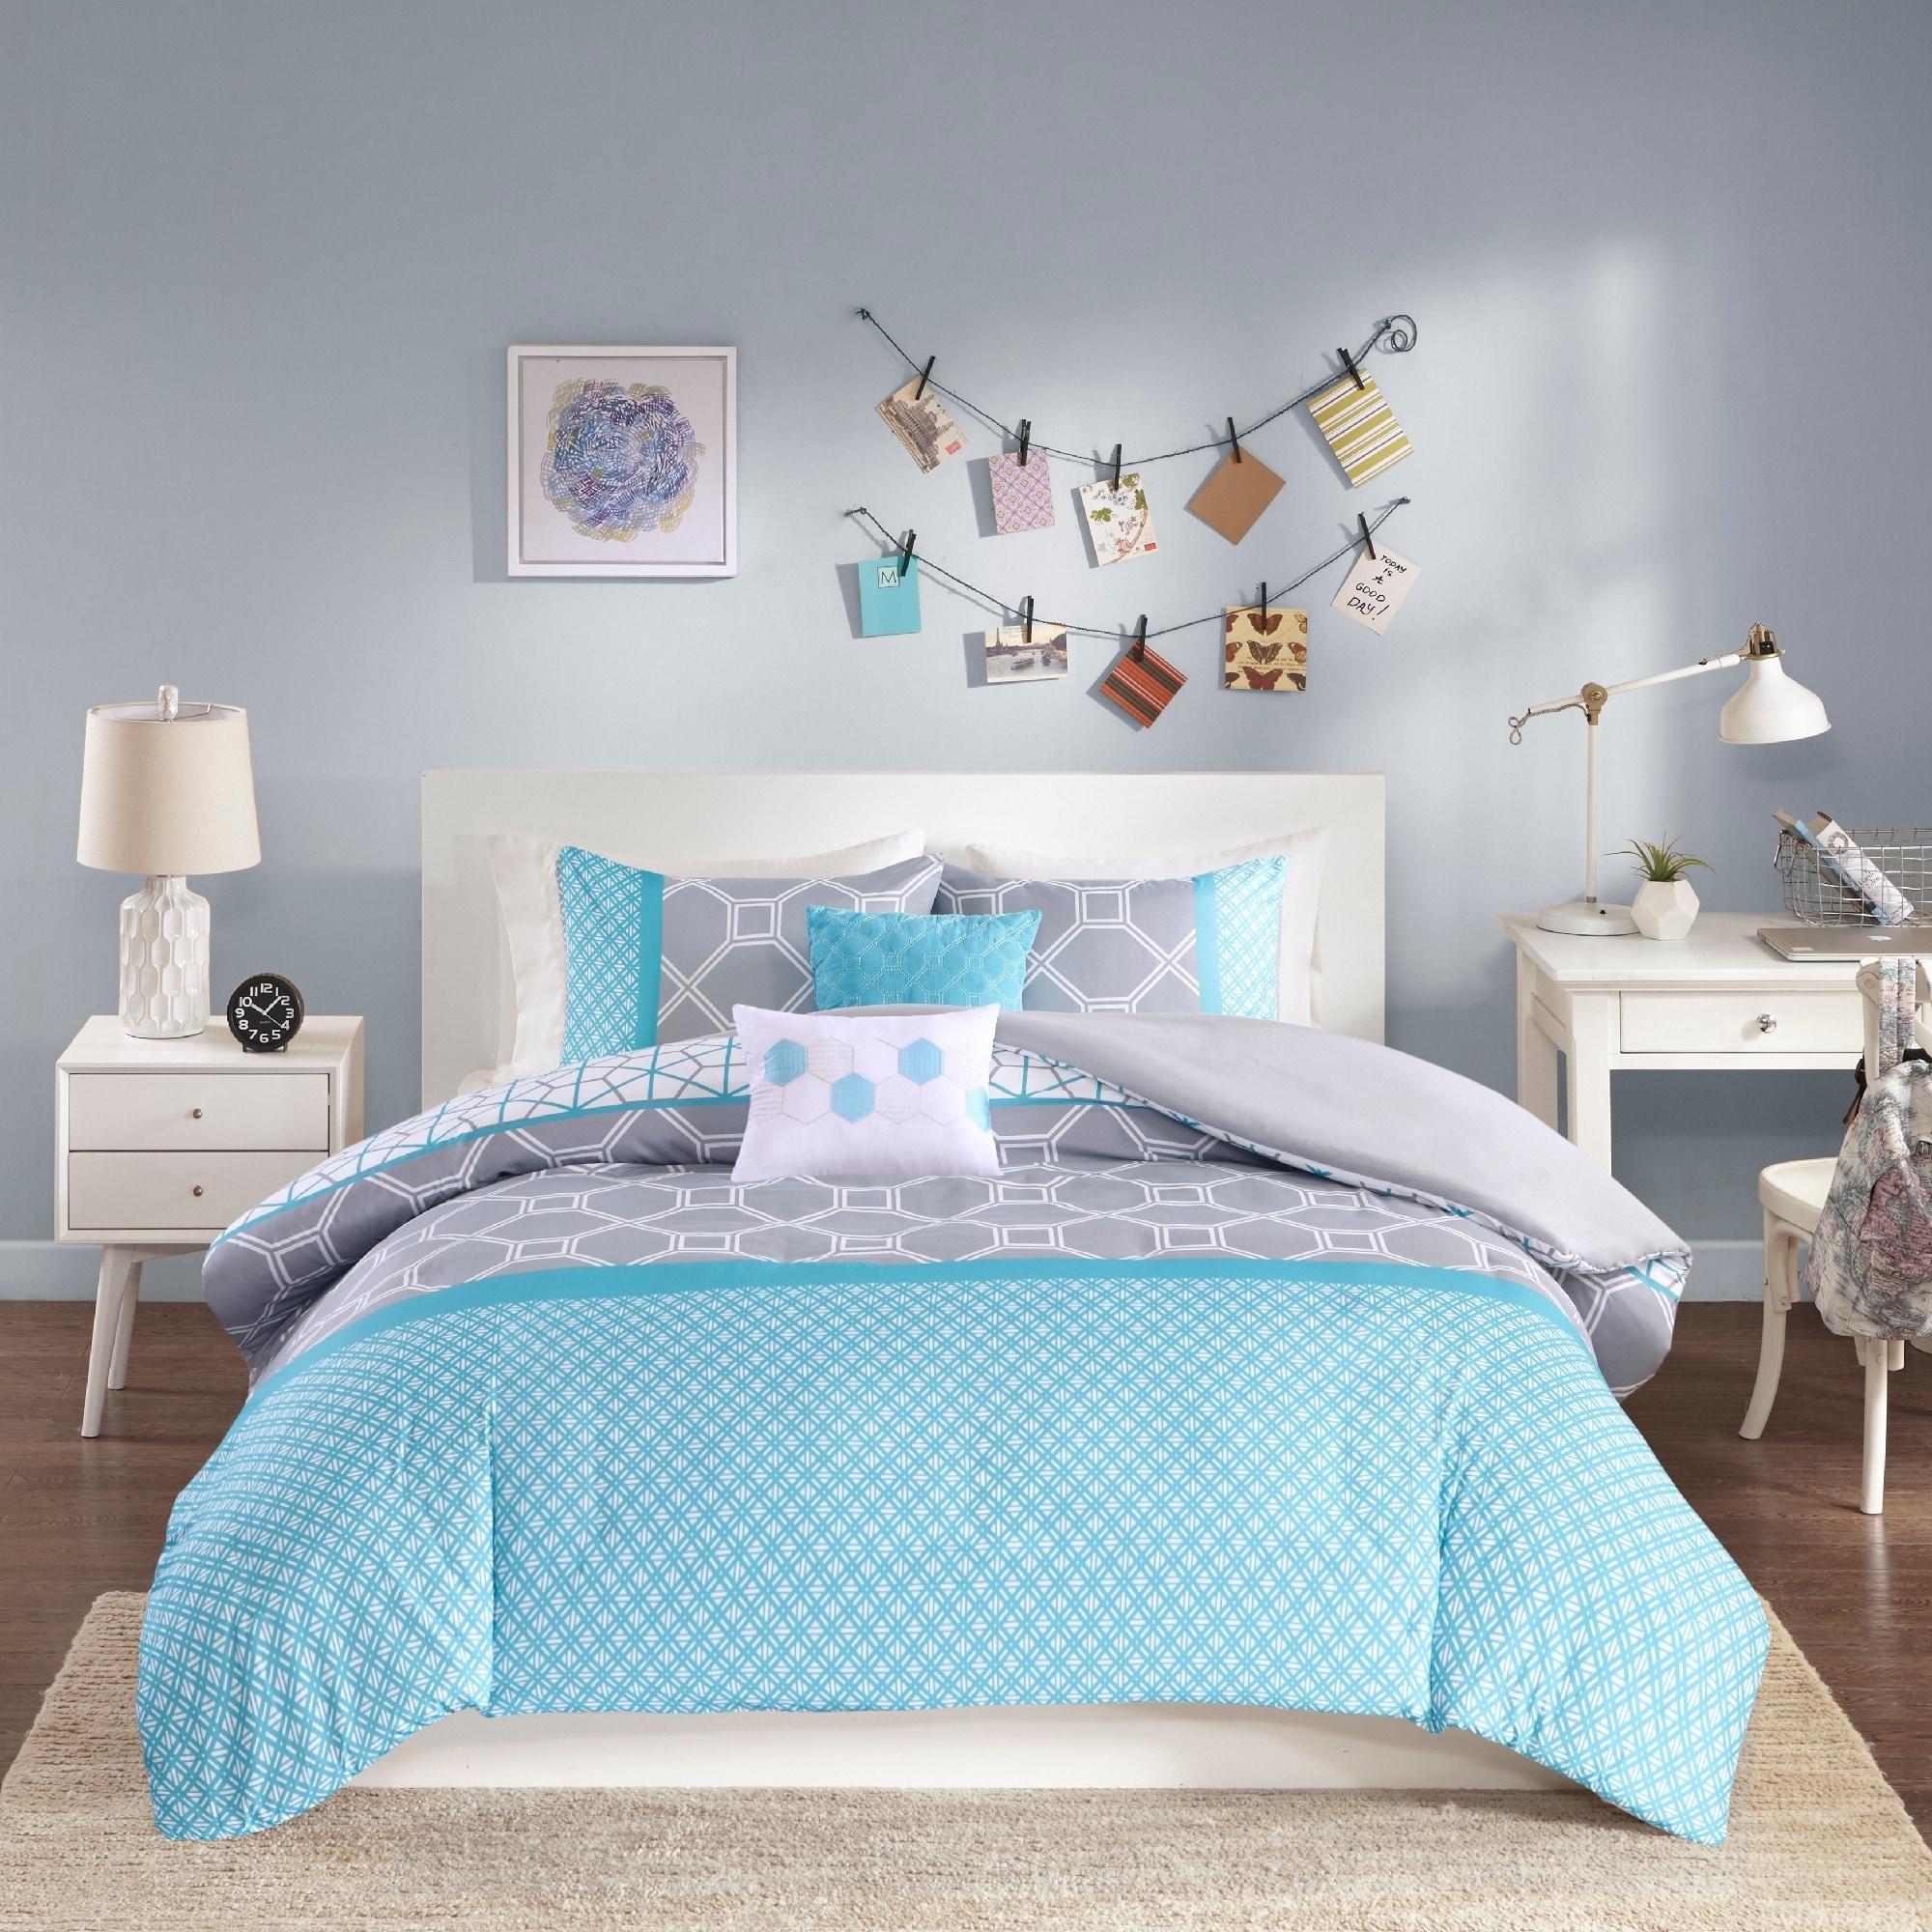 cotton piece lullaby printed bedding bed com butterfly comforter overstock garden ip walmart set